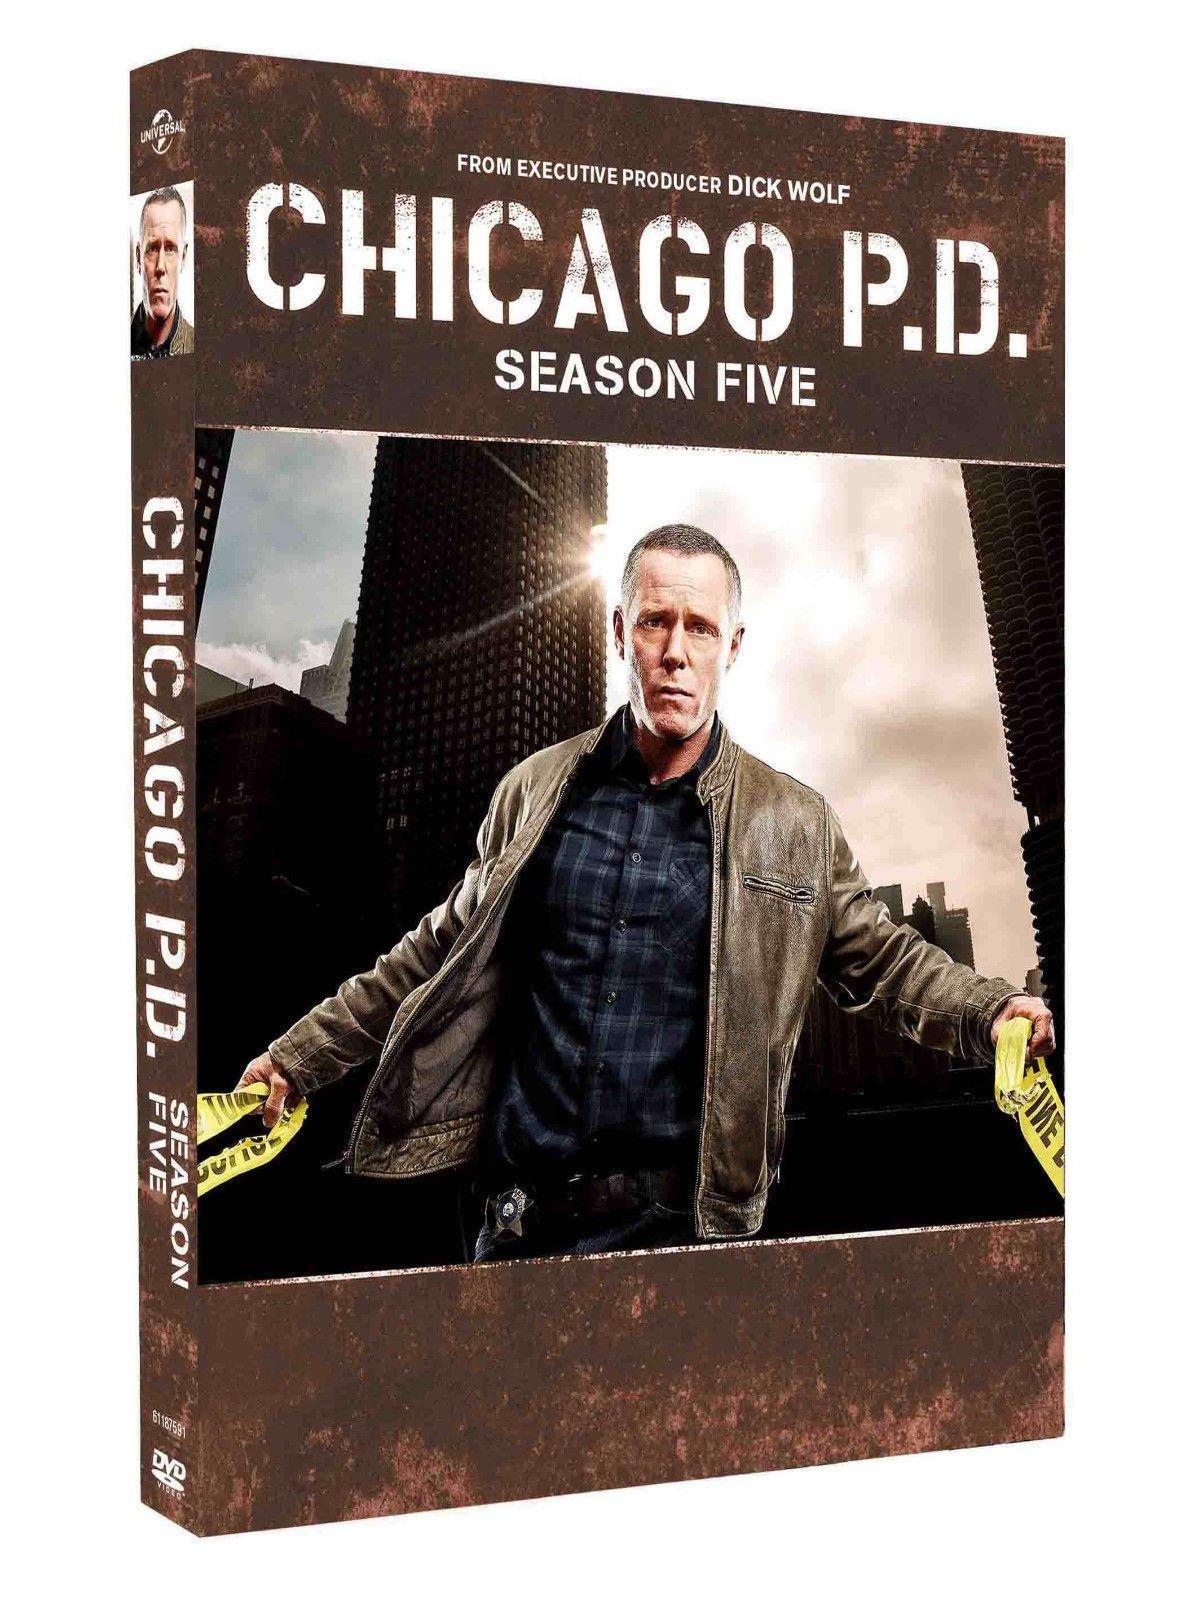 Chicago P.D. Season 5 (DVD,2018,5-Disc) New